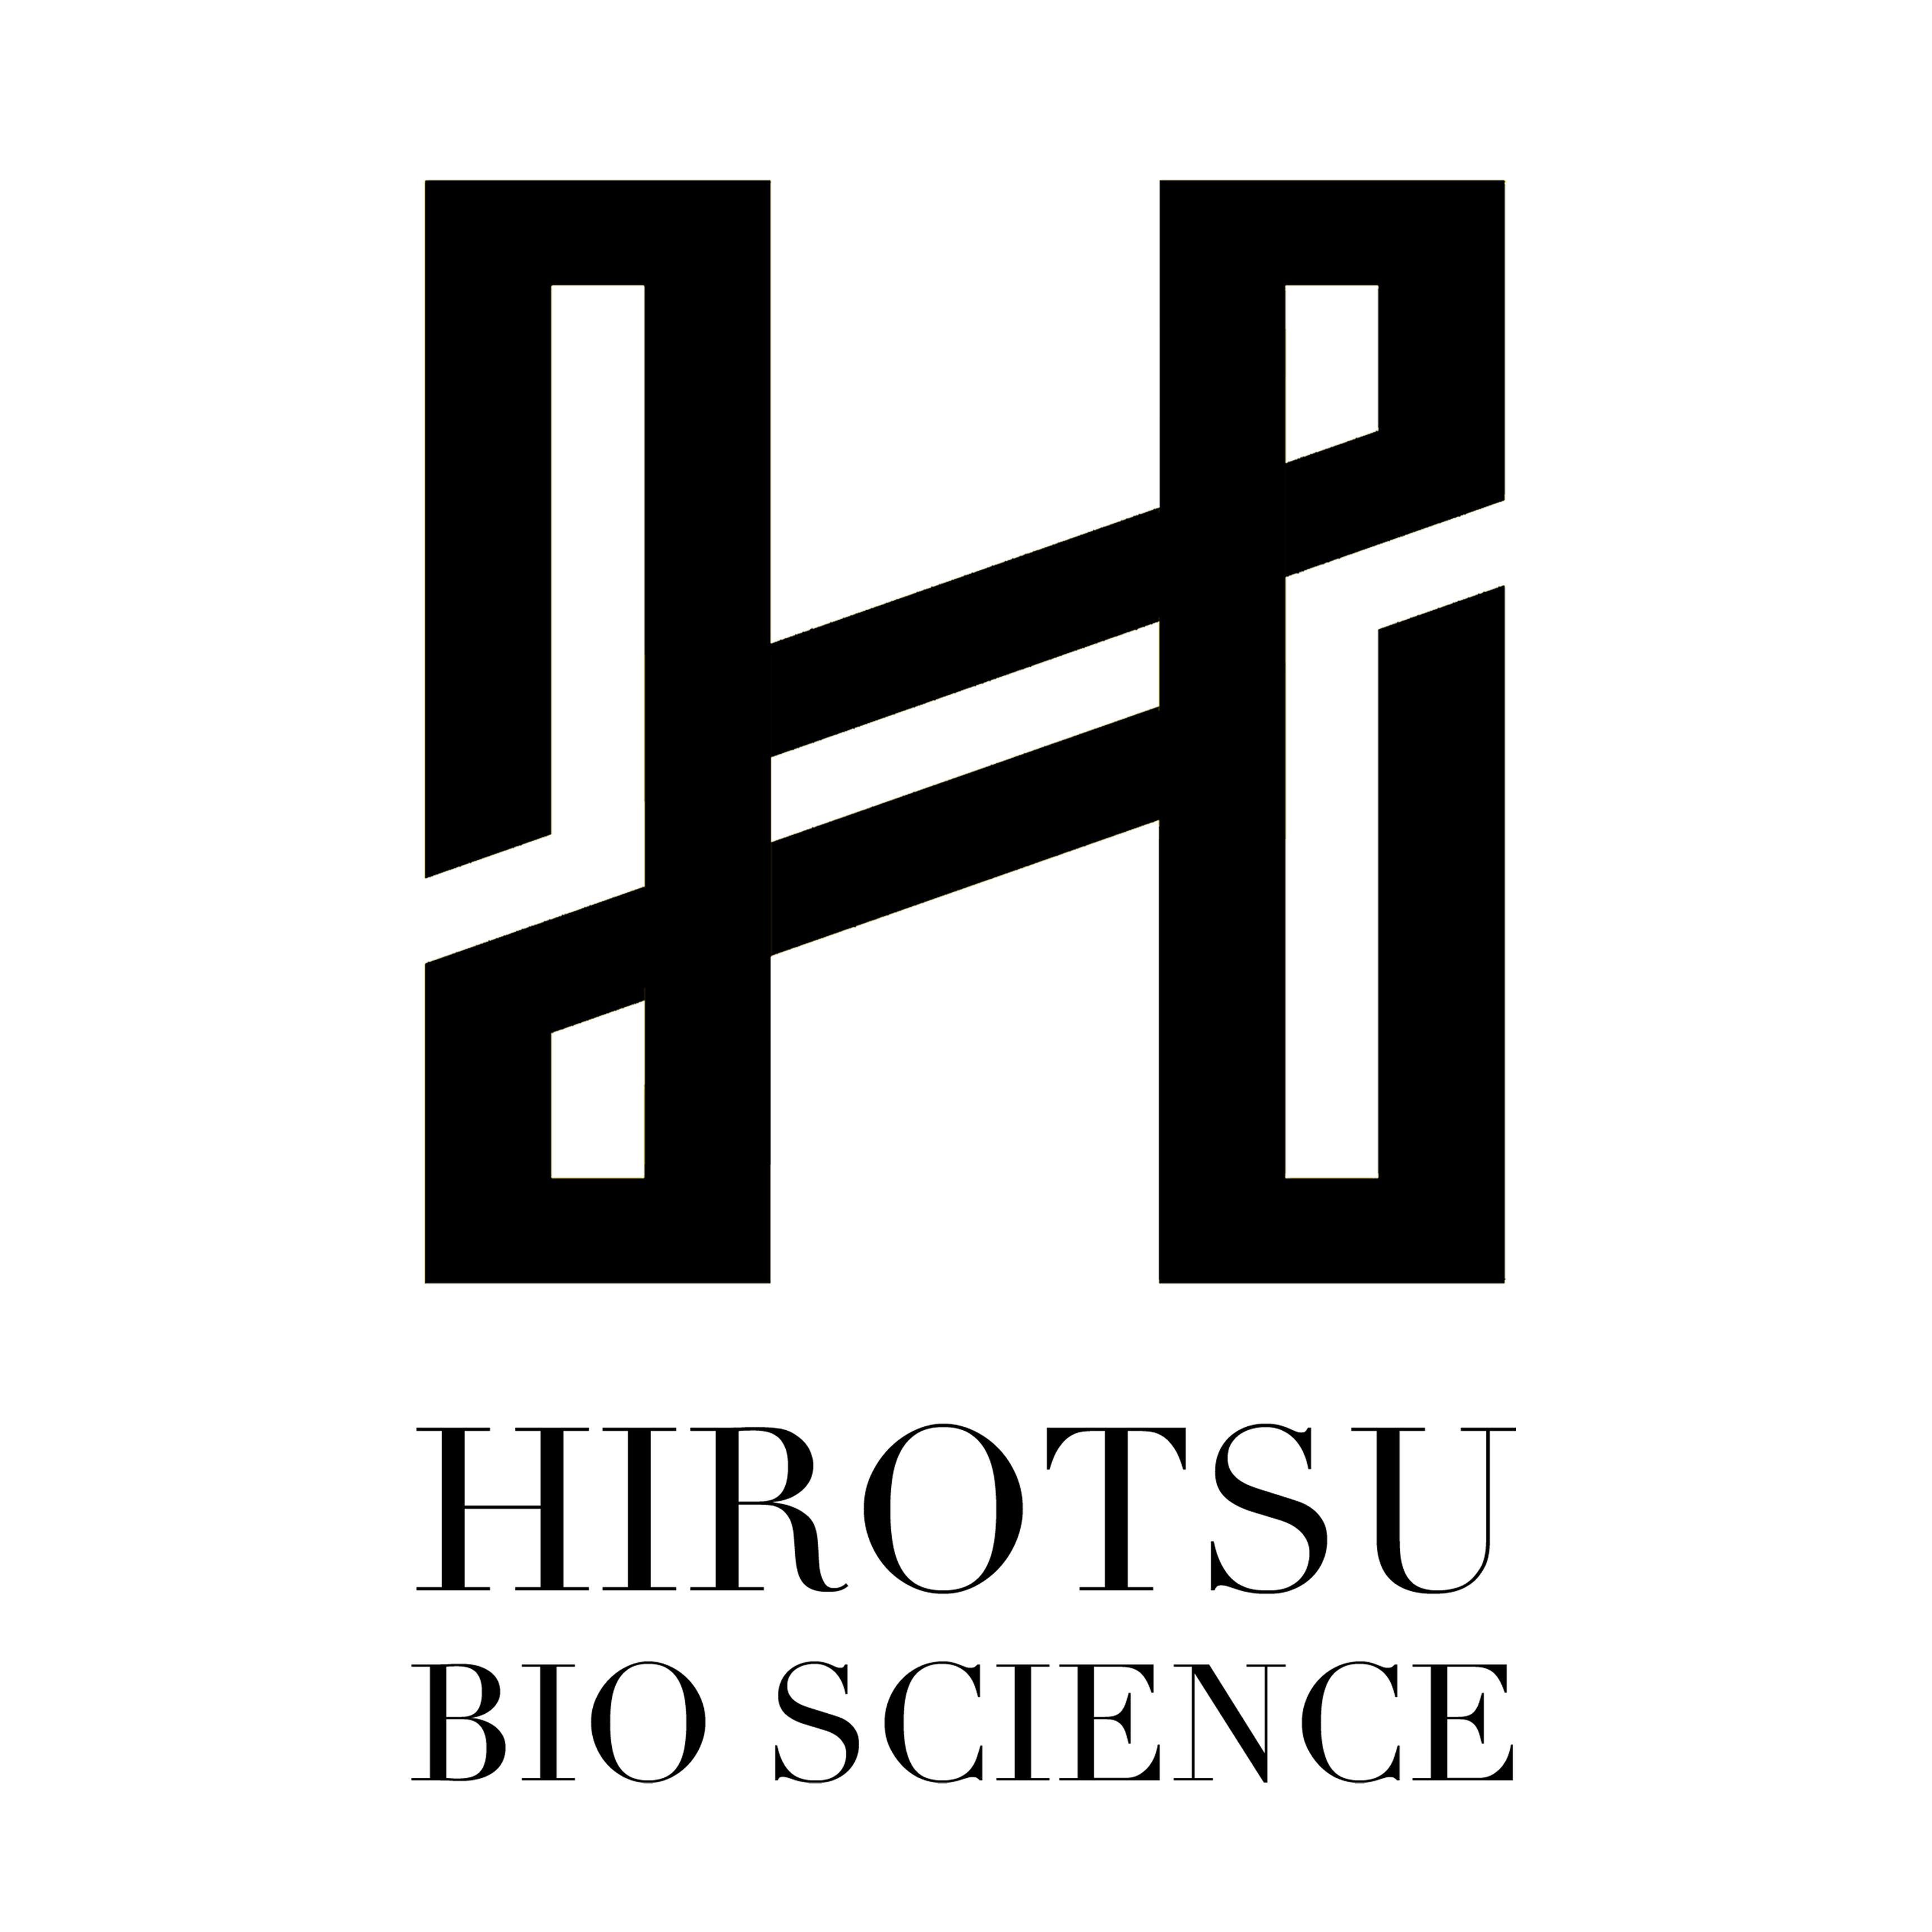 HIROTSU BIO SCIENCE INC.